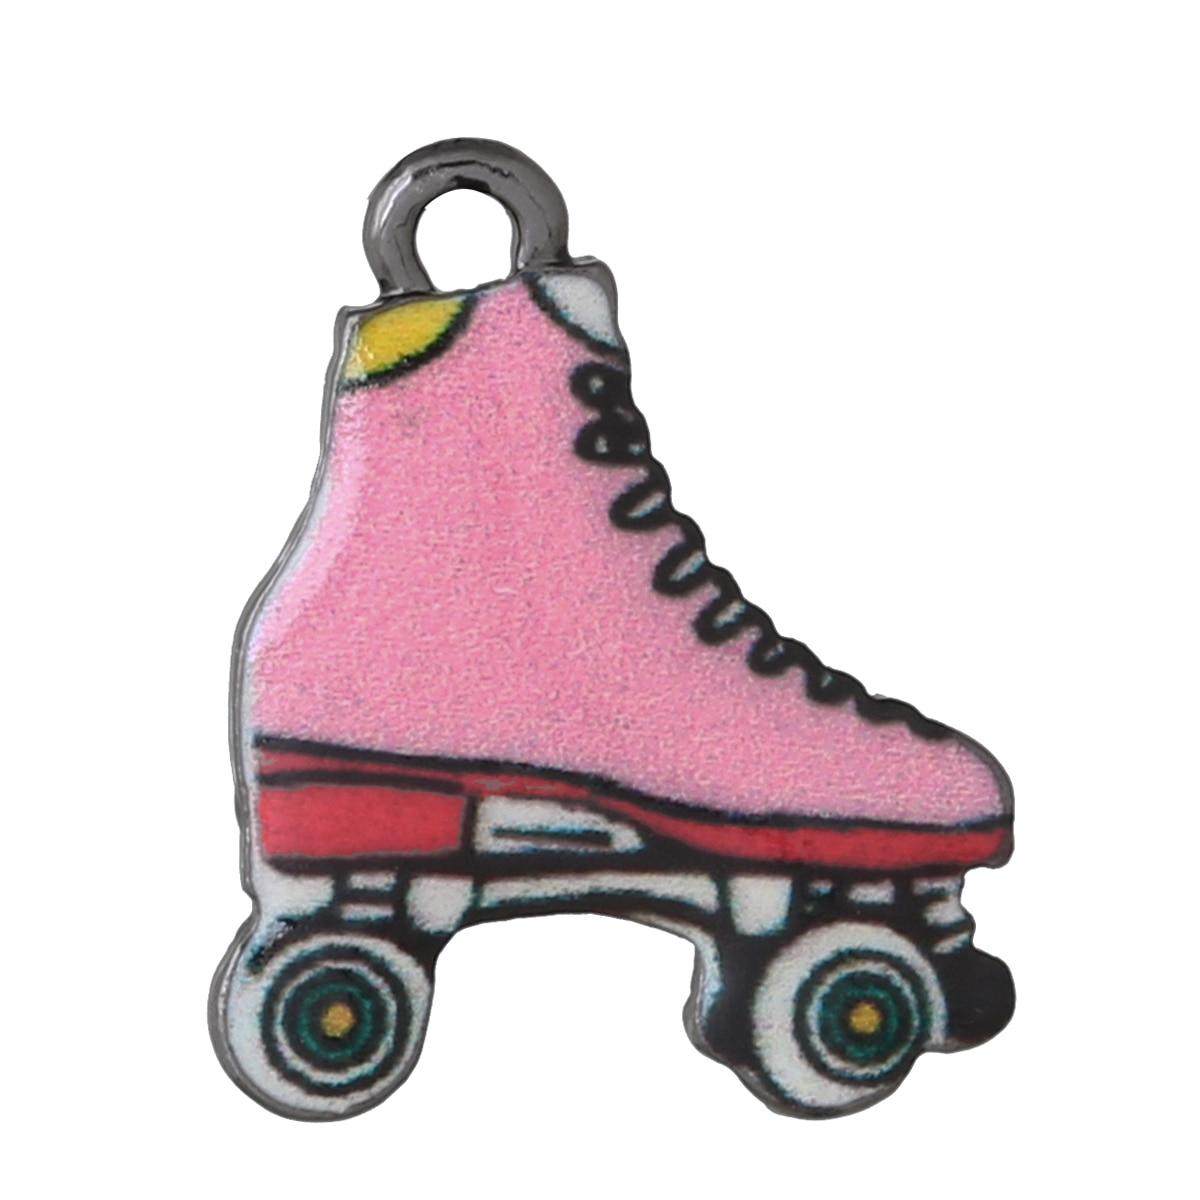 Roller skating shoes price in pakistan - Doreenbeads Charm Pendants Roller Skates Gunmetal Multicolor Enamel 20mm 6 8 X